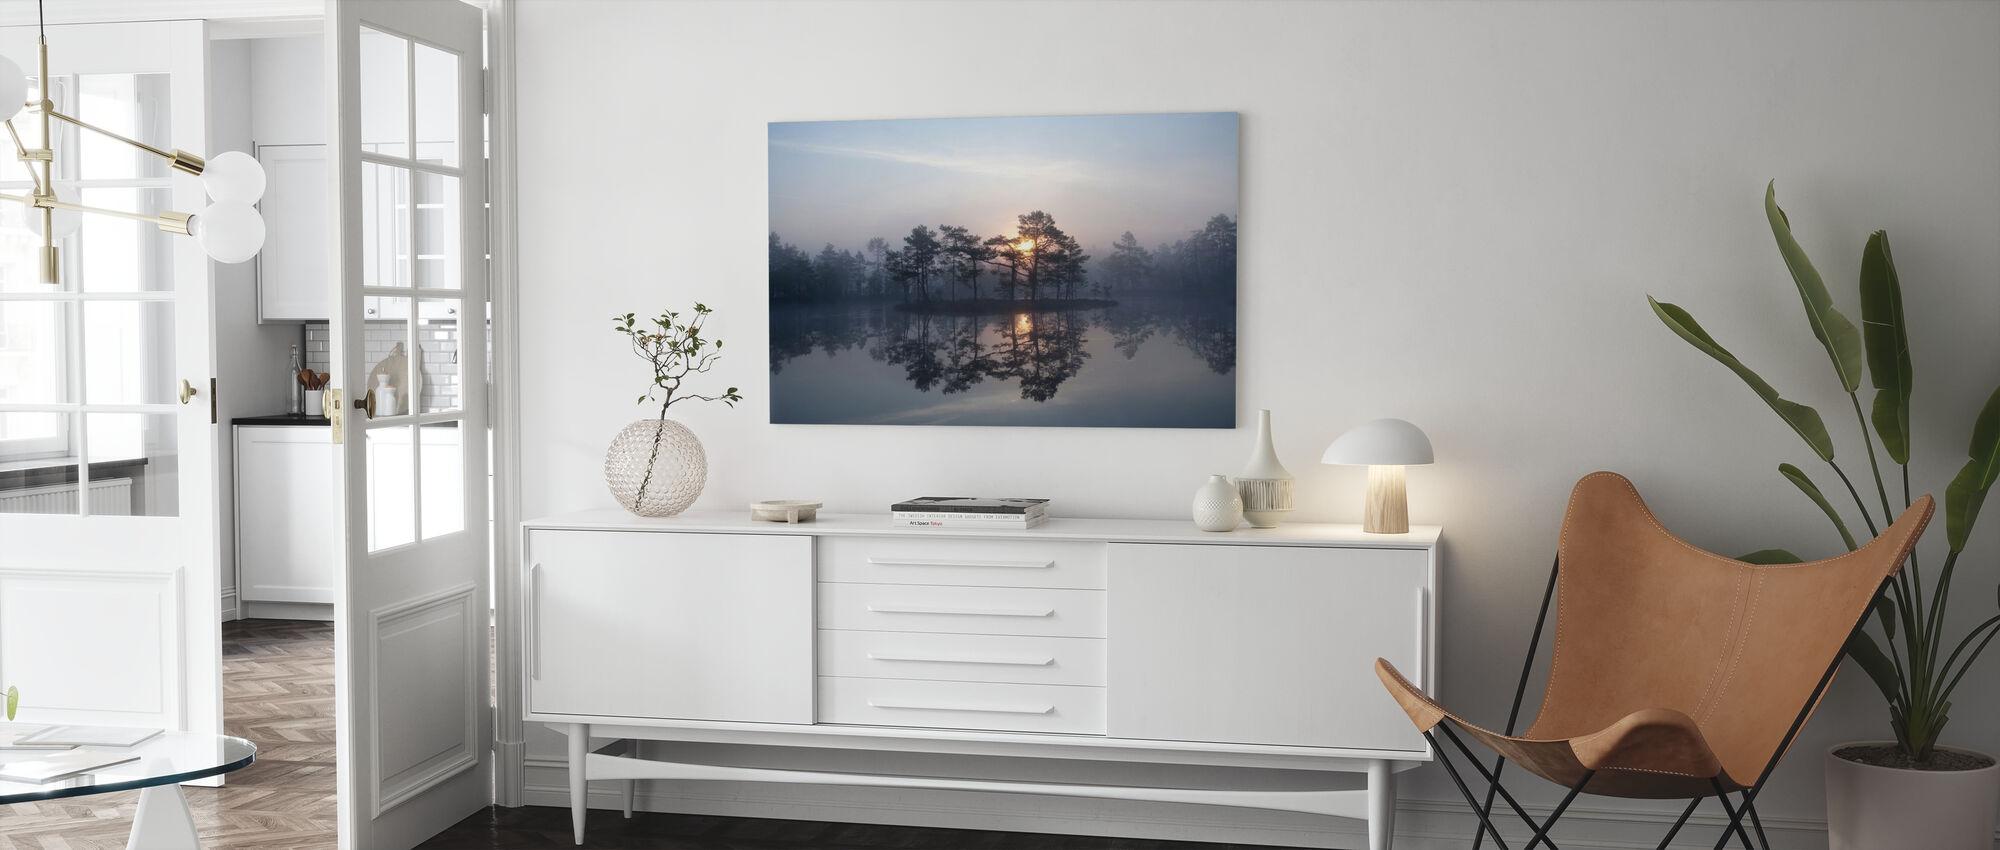 Betoverende mist - Canvas print - Woonkamer